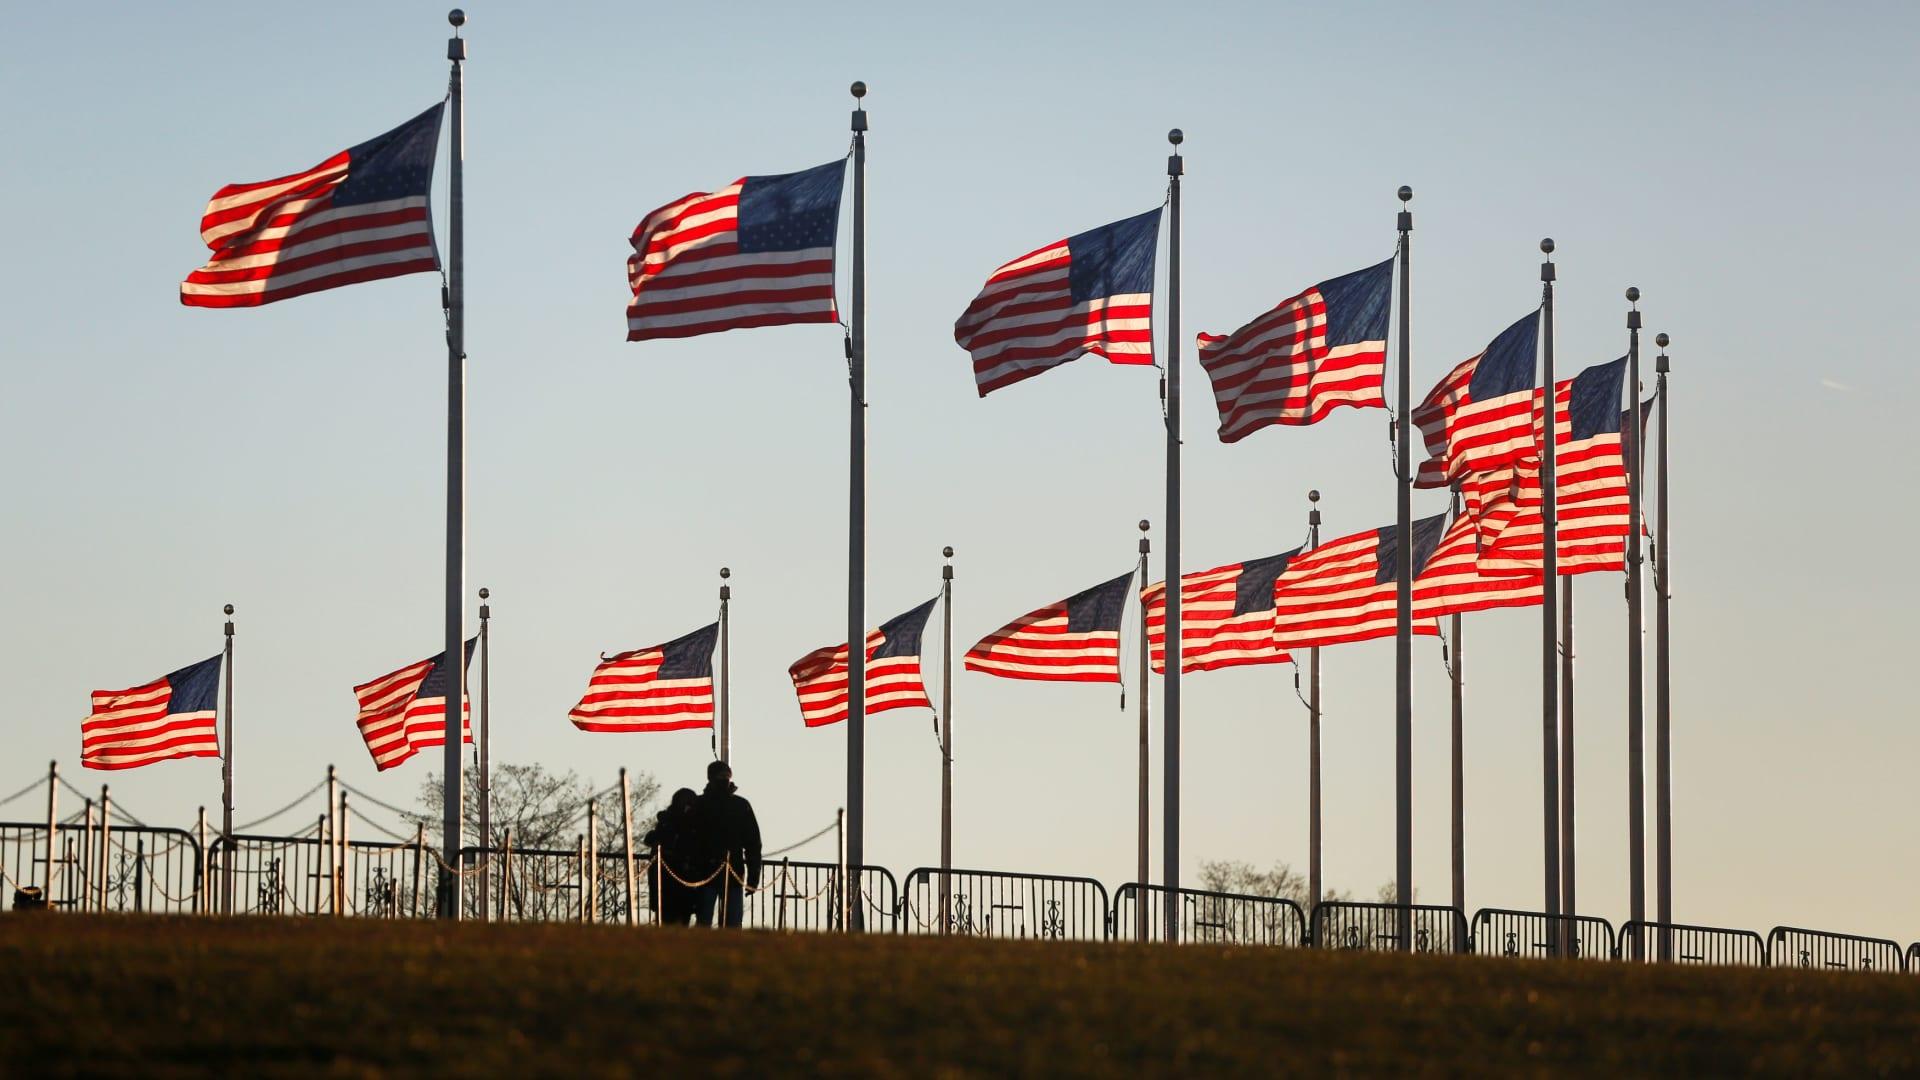 The Washington Monument plaza, three days the Jan. 6, 2021, riot at the U.S. Capitol.